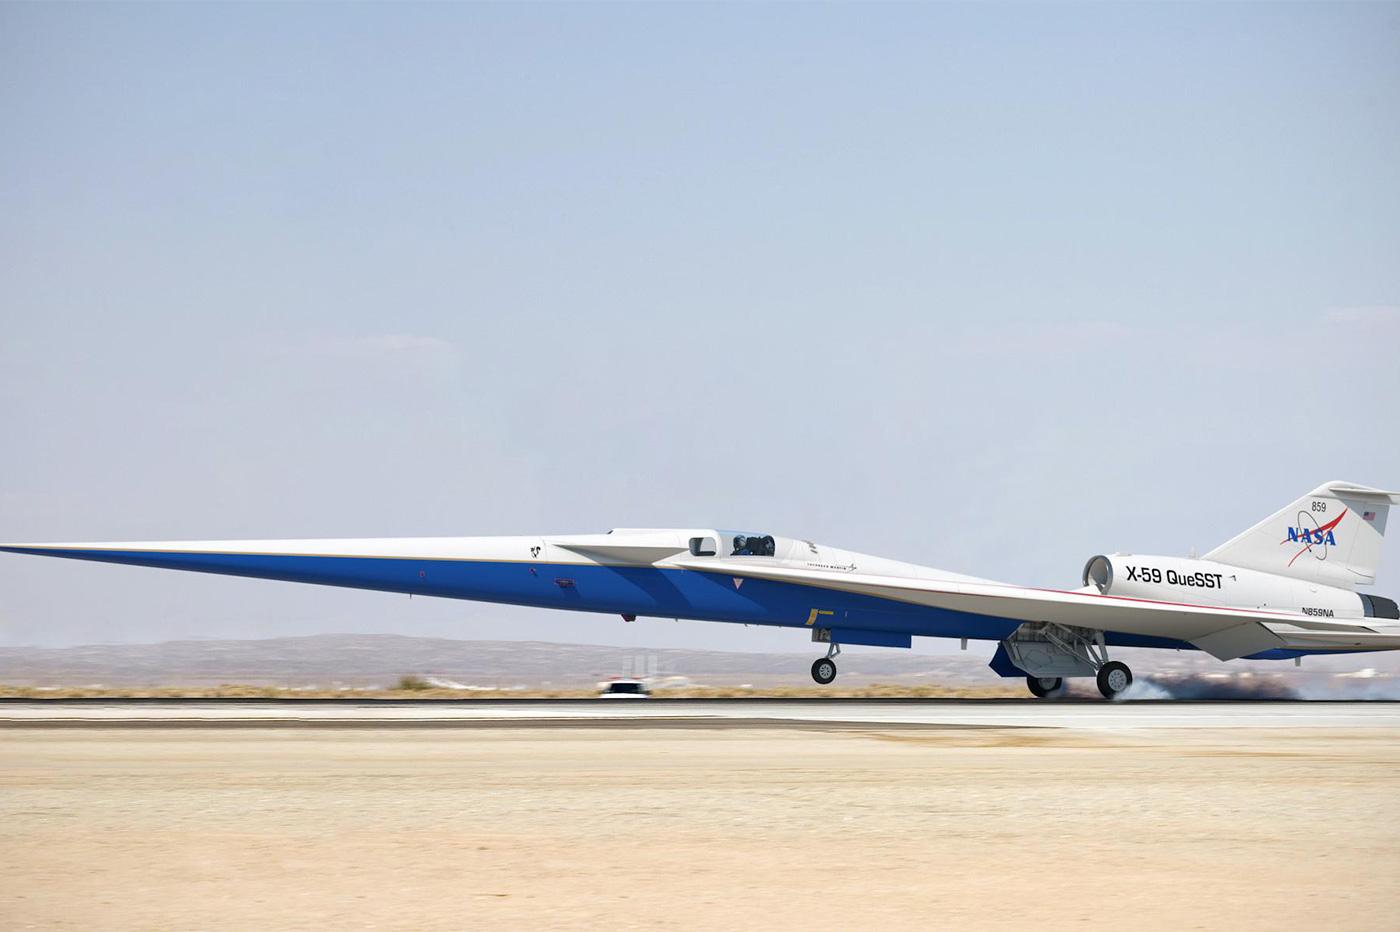 NASA Concorde x59 queSST